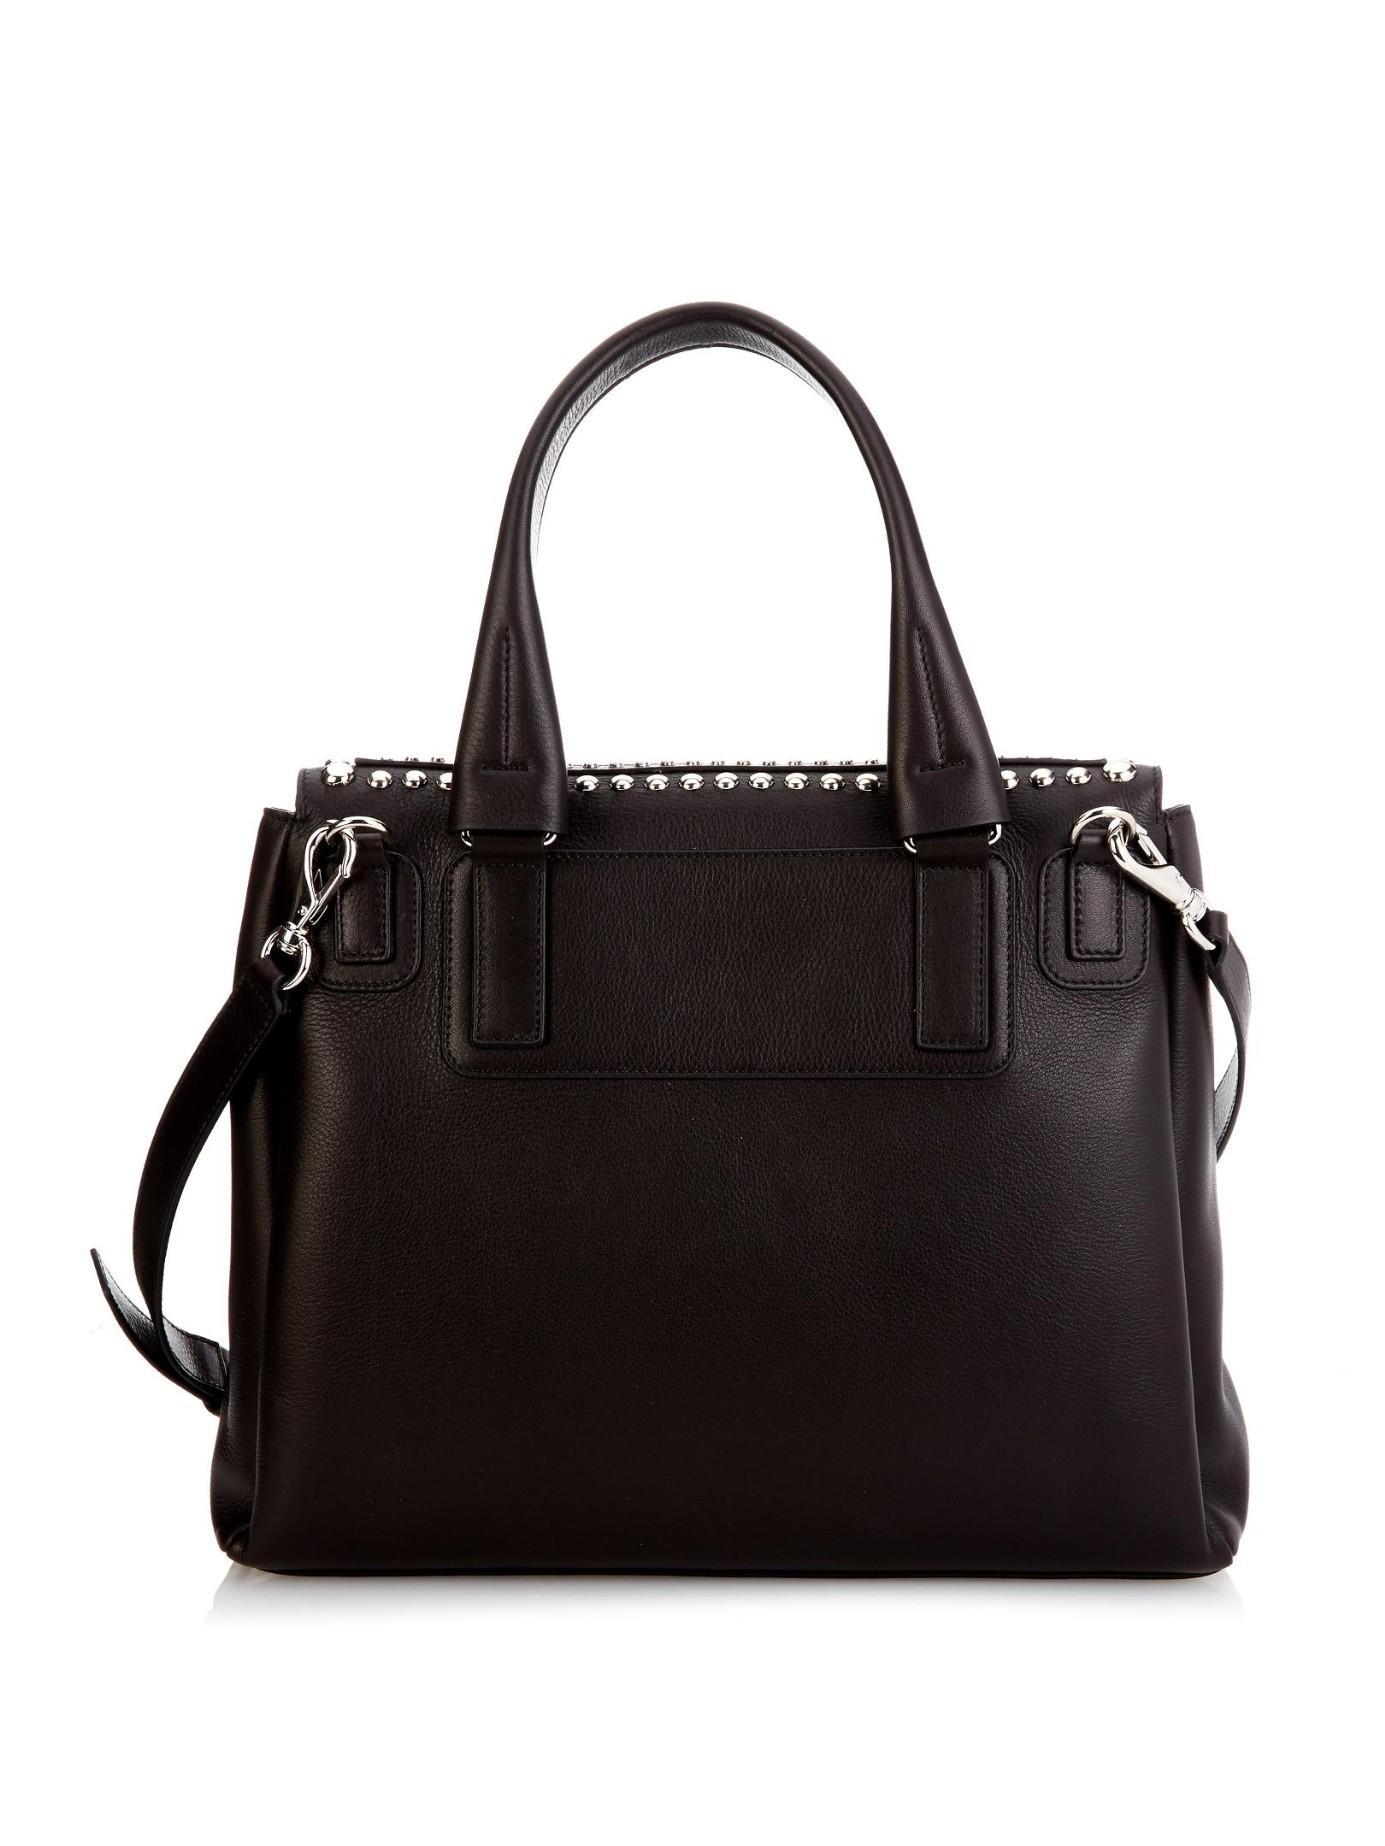 Givenchy Pandora Pure Medium Leather Bag in Black